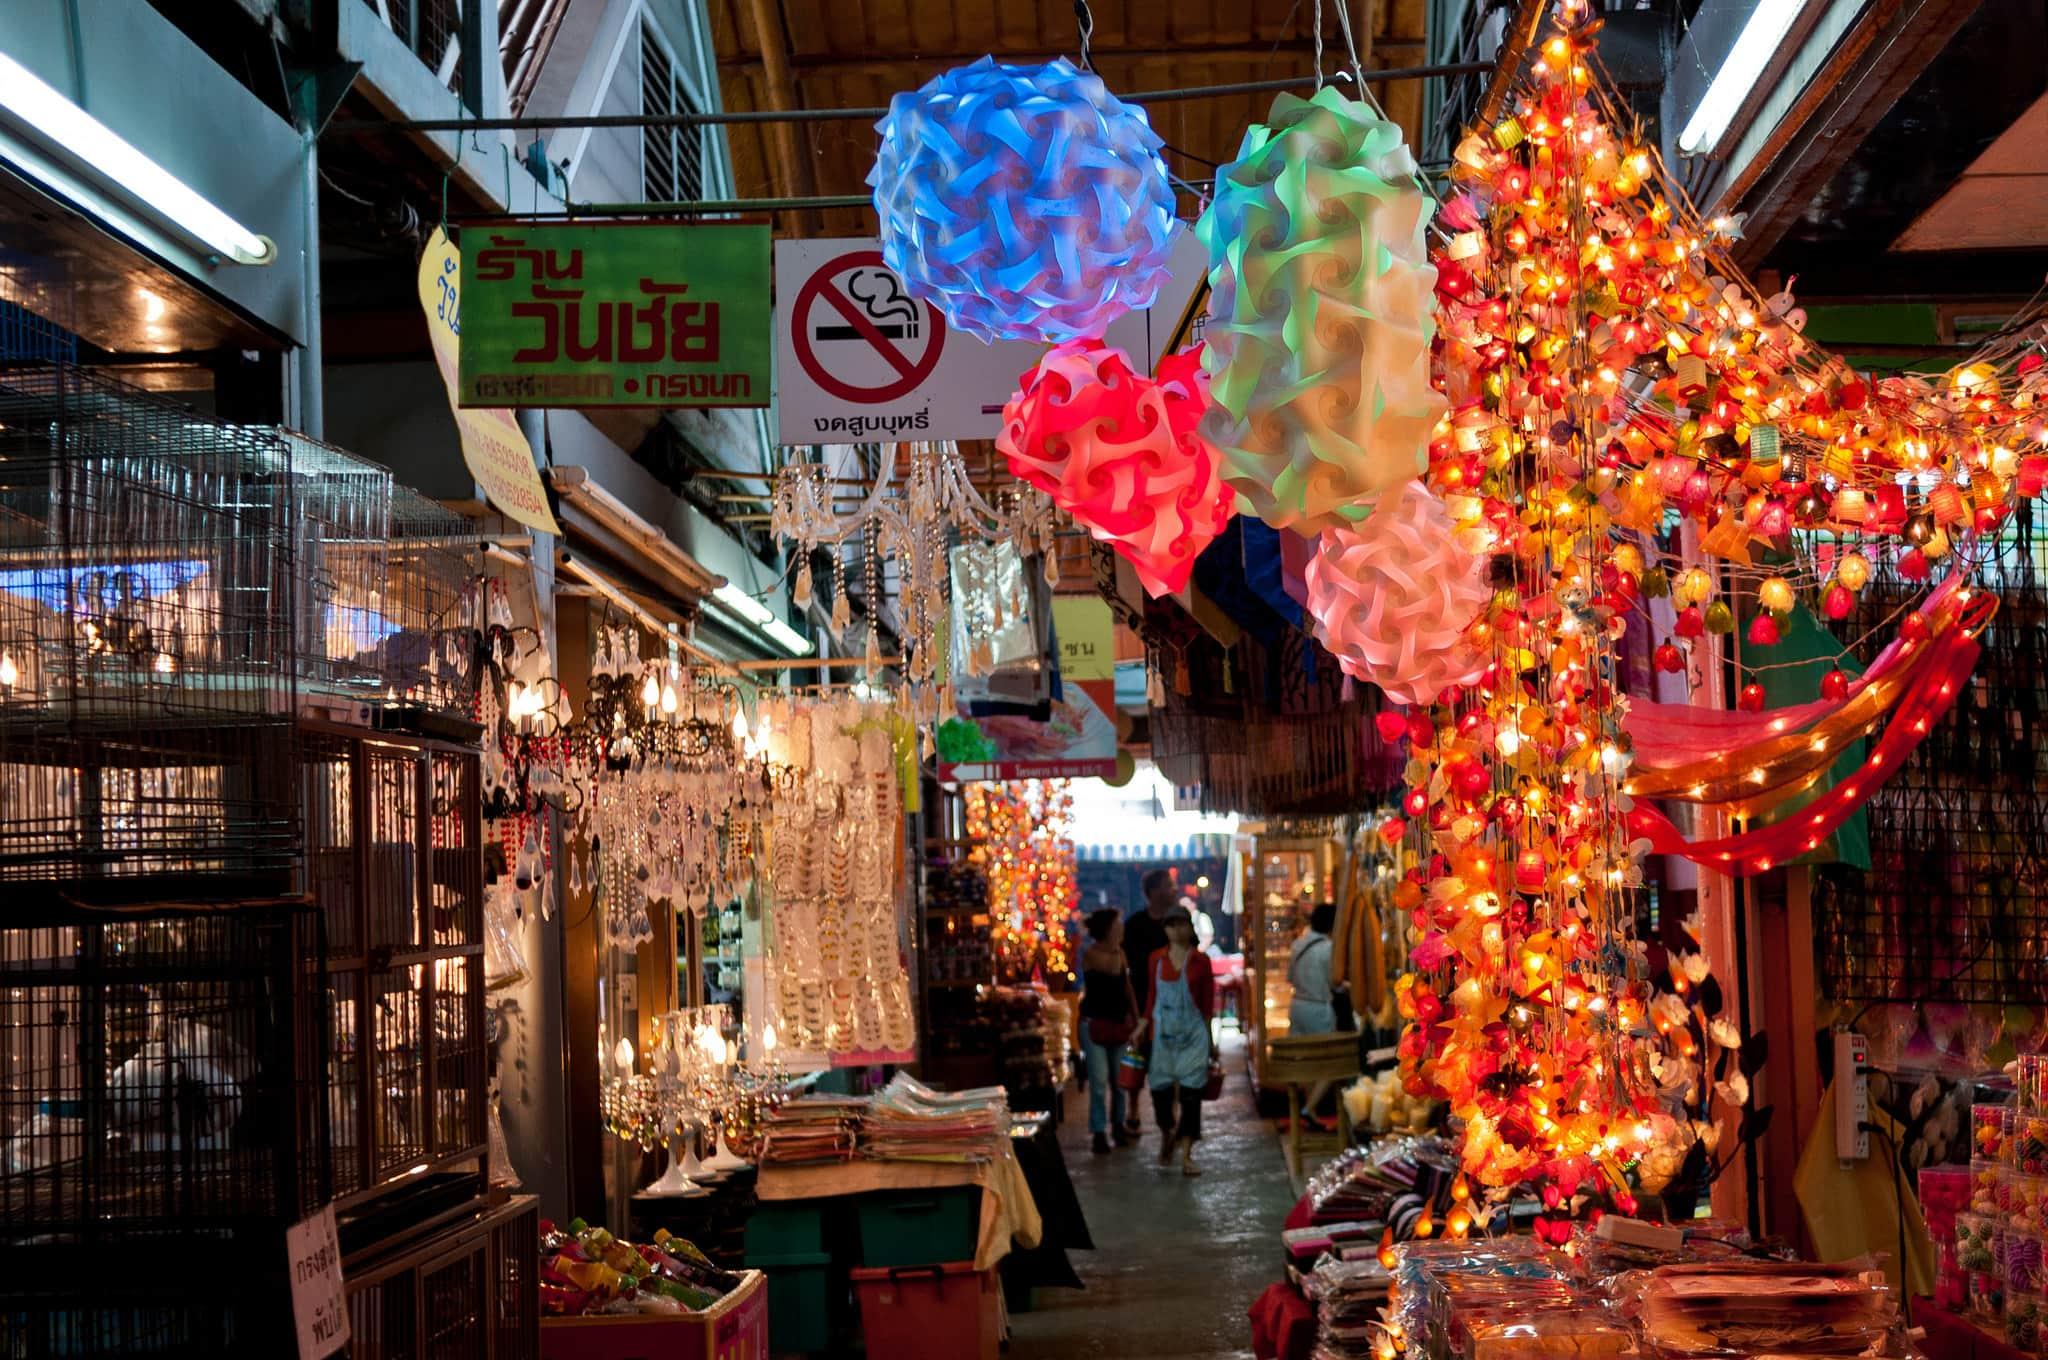 Thailand tourist spots, Chatuchak Market